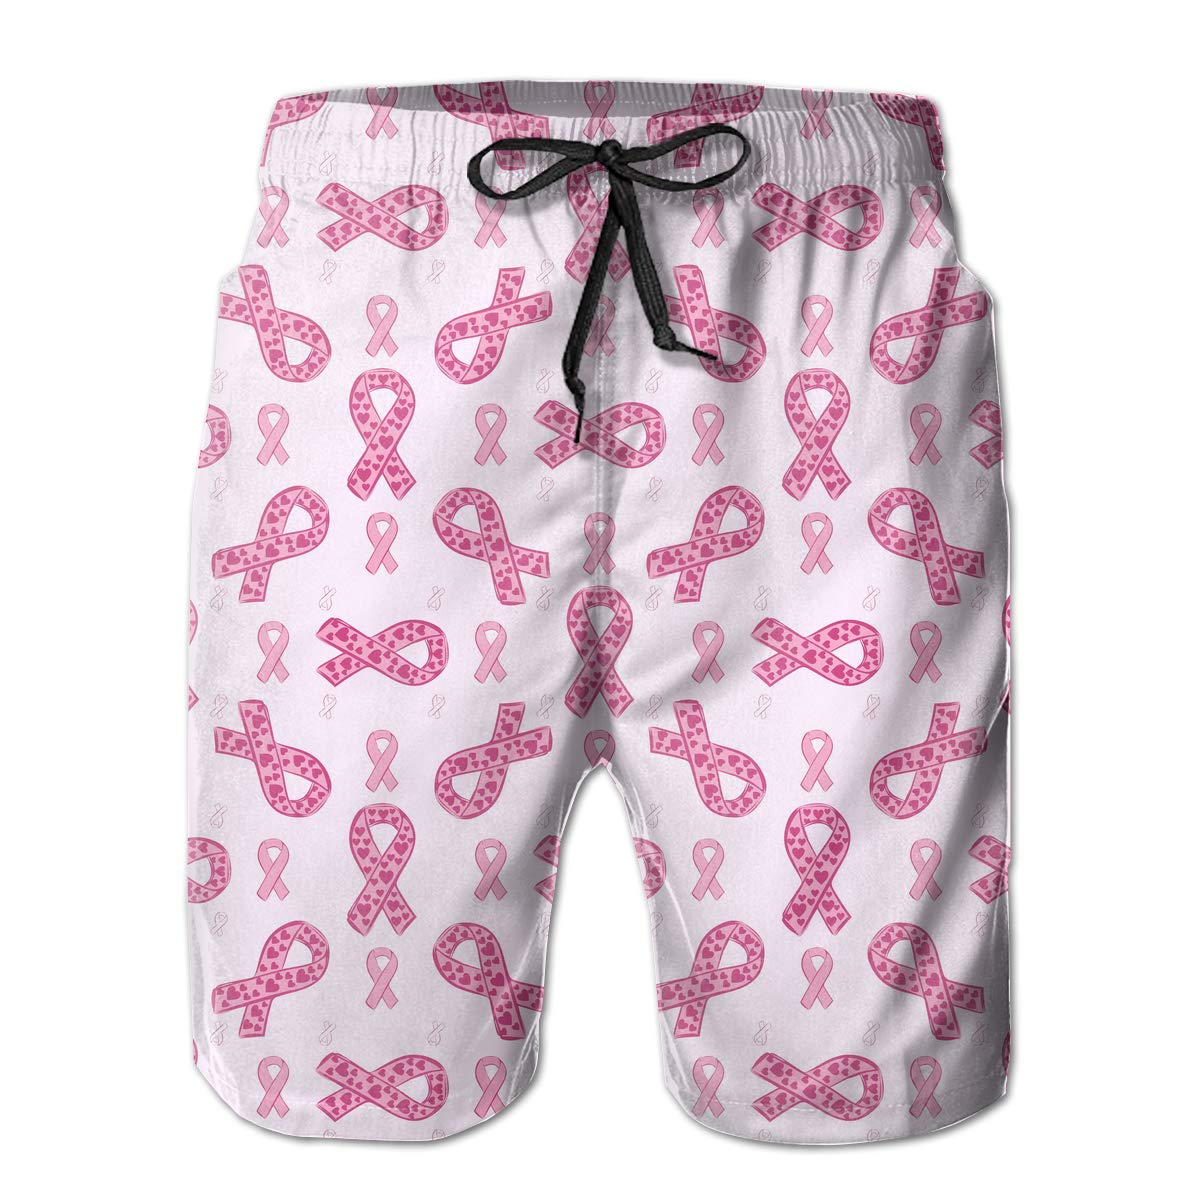 Xk7@KU Mens Athletic Swim Trunks Polyester Pink Ribbon and Heart Pattern Beachwear with Pockets